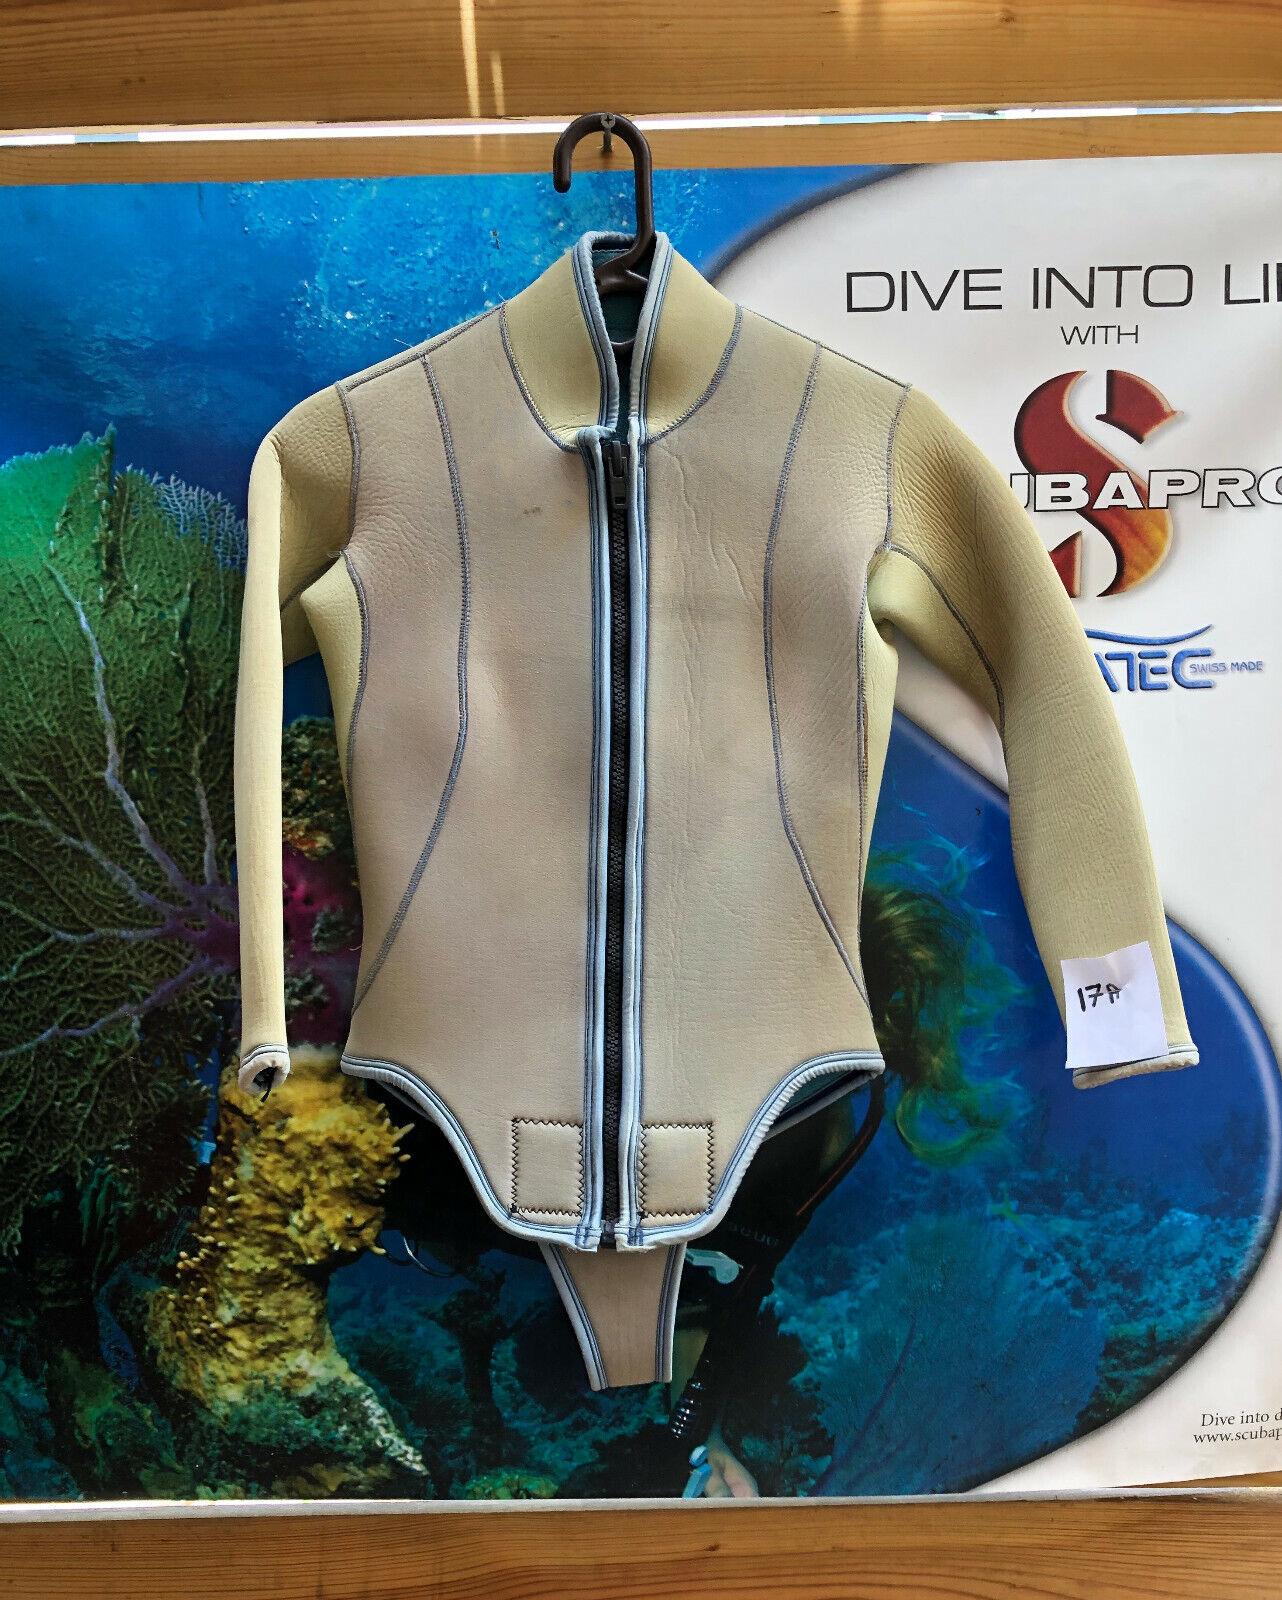 Medium Women's 2 Piece Wetsuit, 5mm, Tan w Light bluee